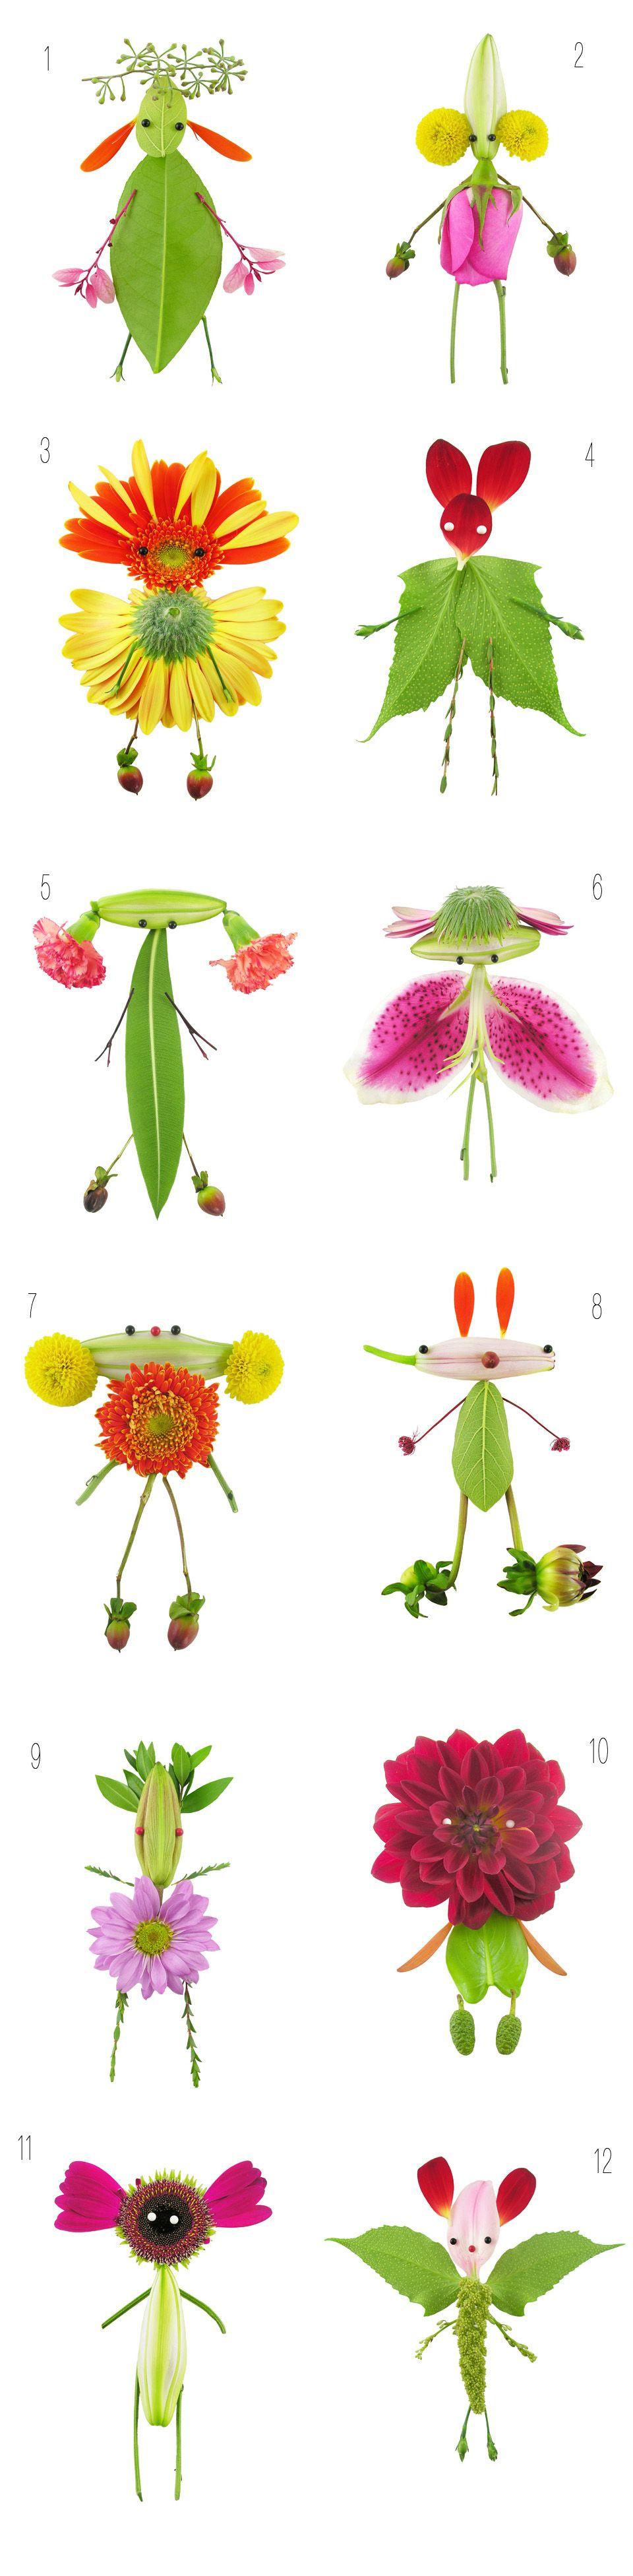 Elsa mora art is a way fresh flower characters